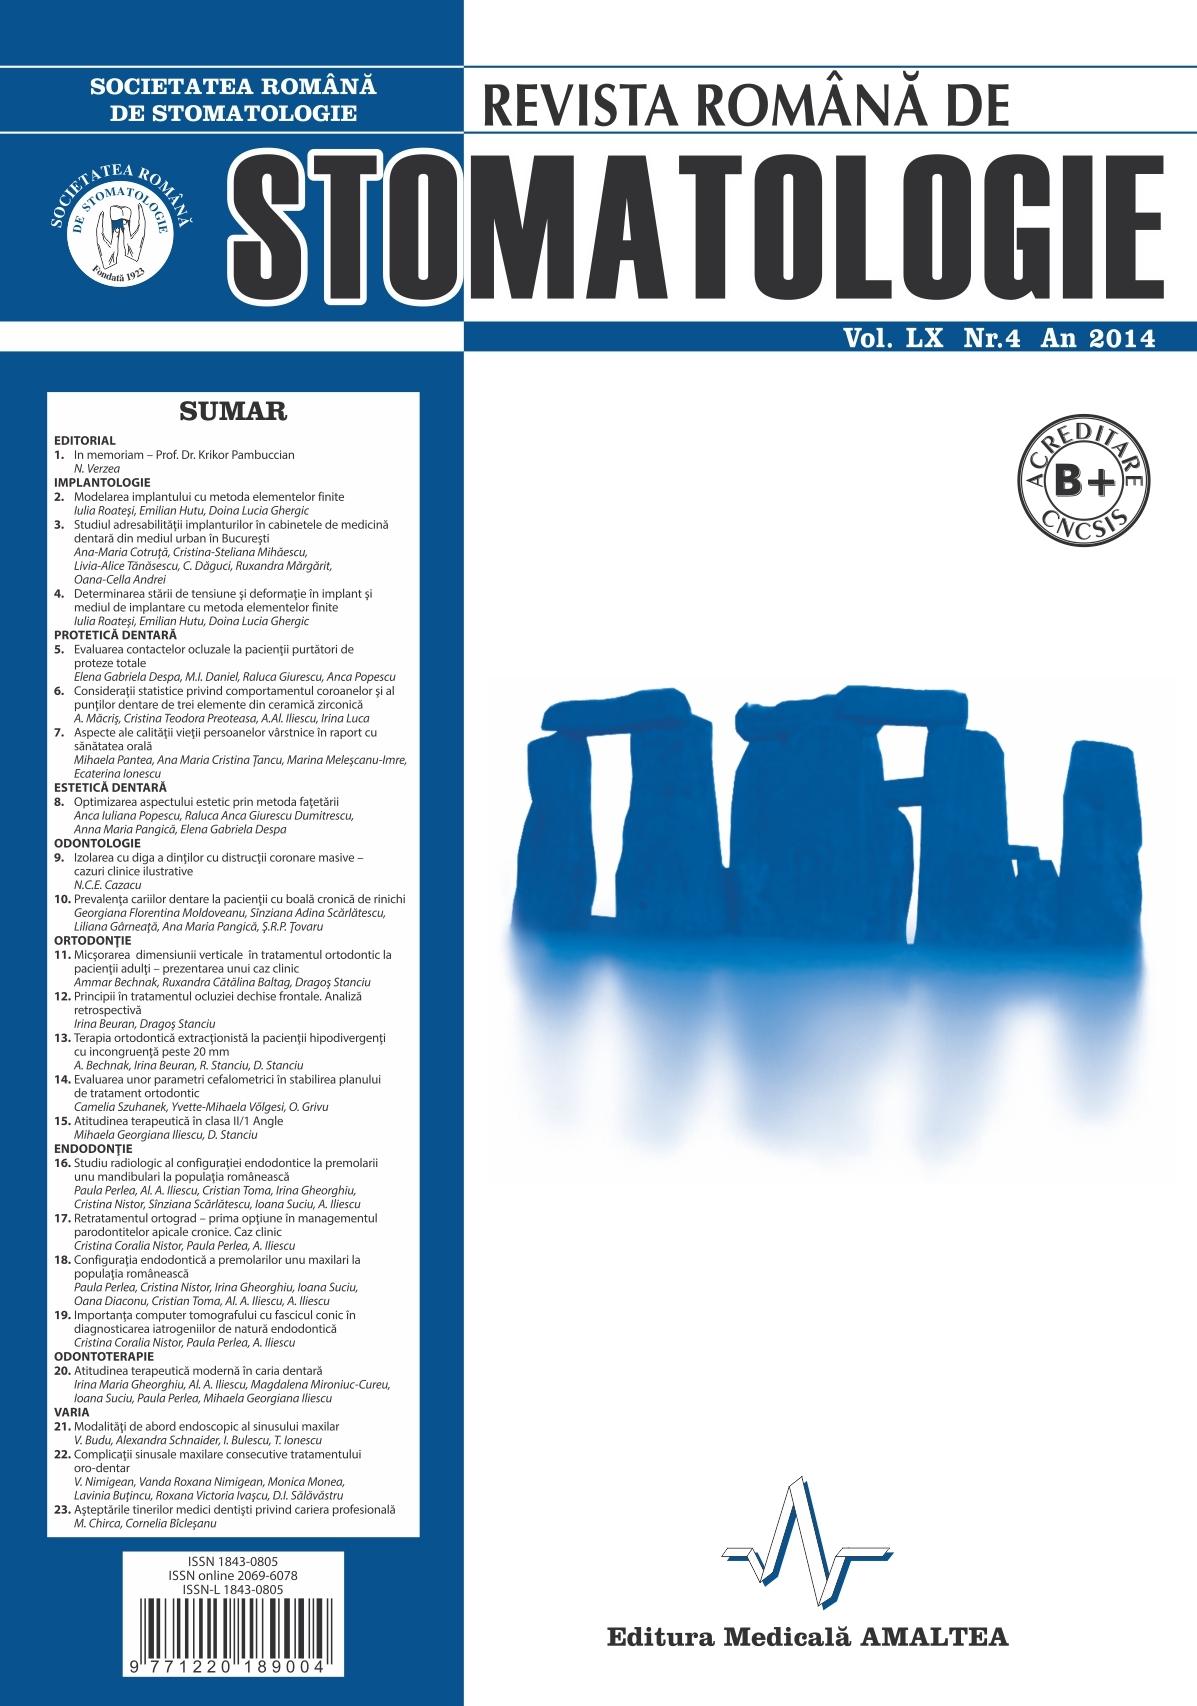 Revista Romana de STOMATOLOGIE - Romanian Journal of Stomatology, Vol. LX, Nr. 4, An 2014